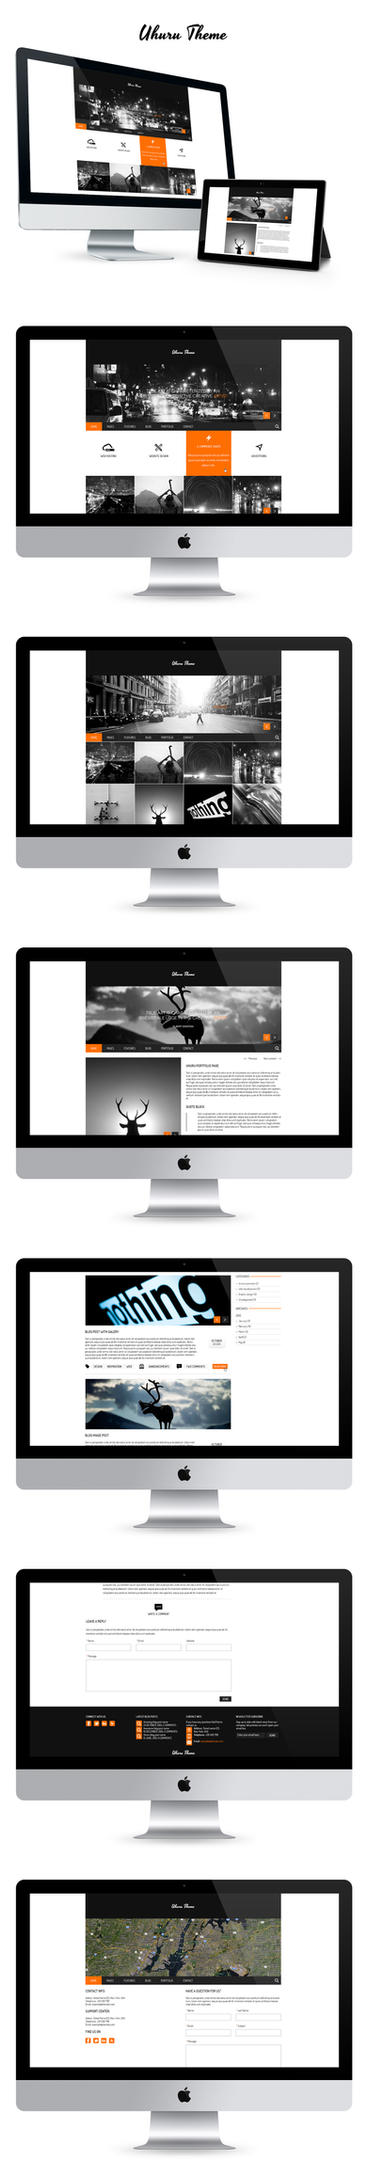 Uhuru Theme by design-mania